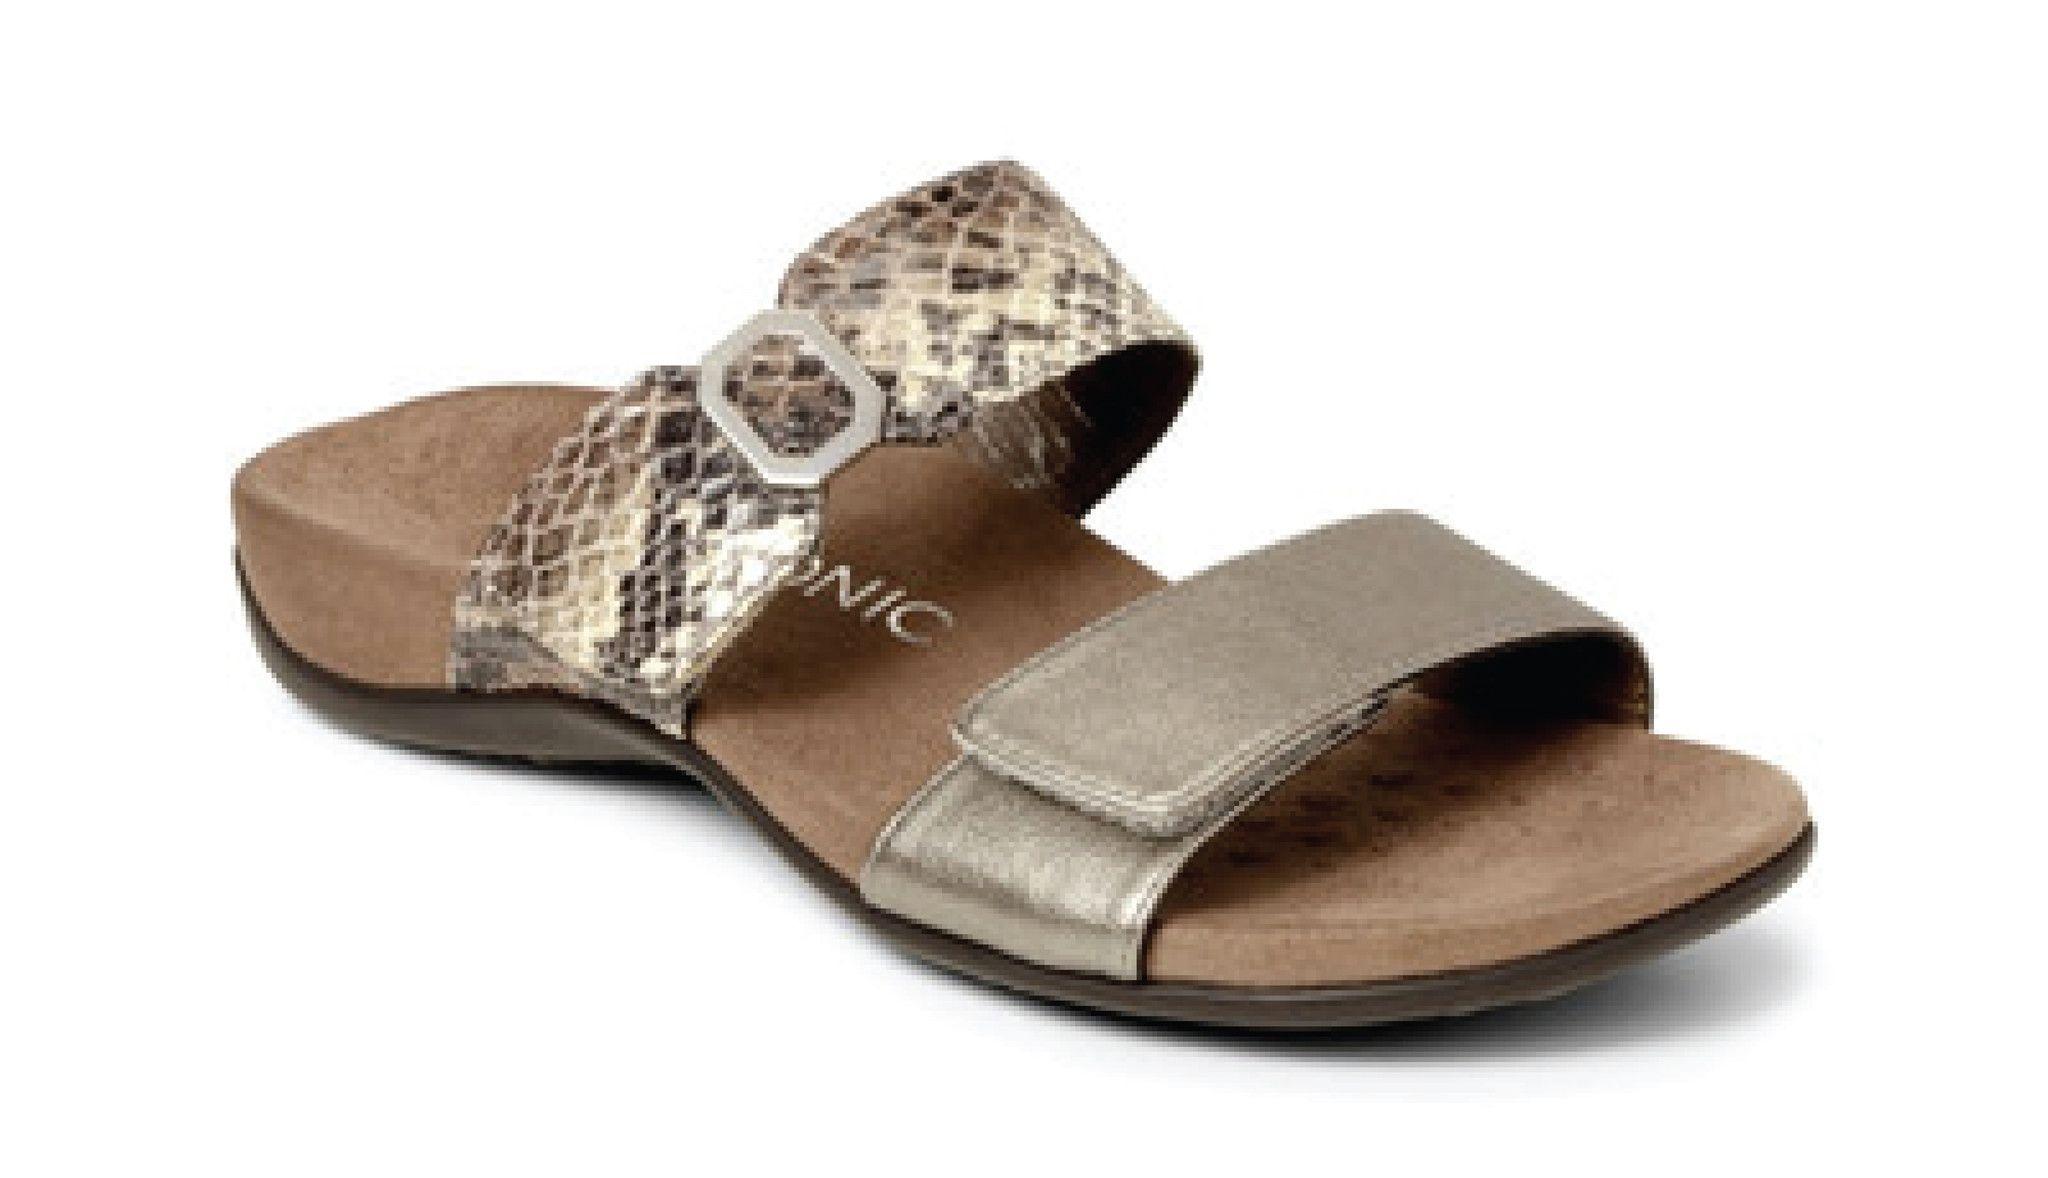 15a1c7440cce VIONIC- REST CAMILA. VIONIC- REST CAMILA Slide Sandals ...